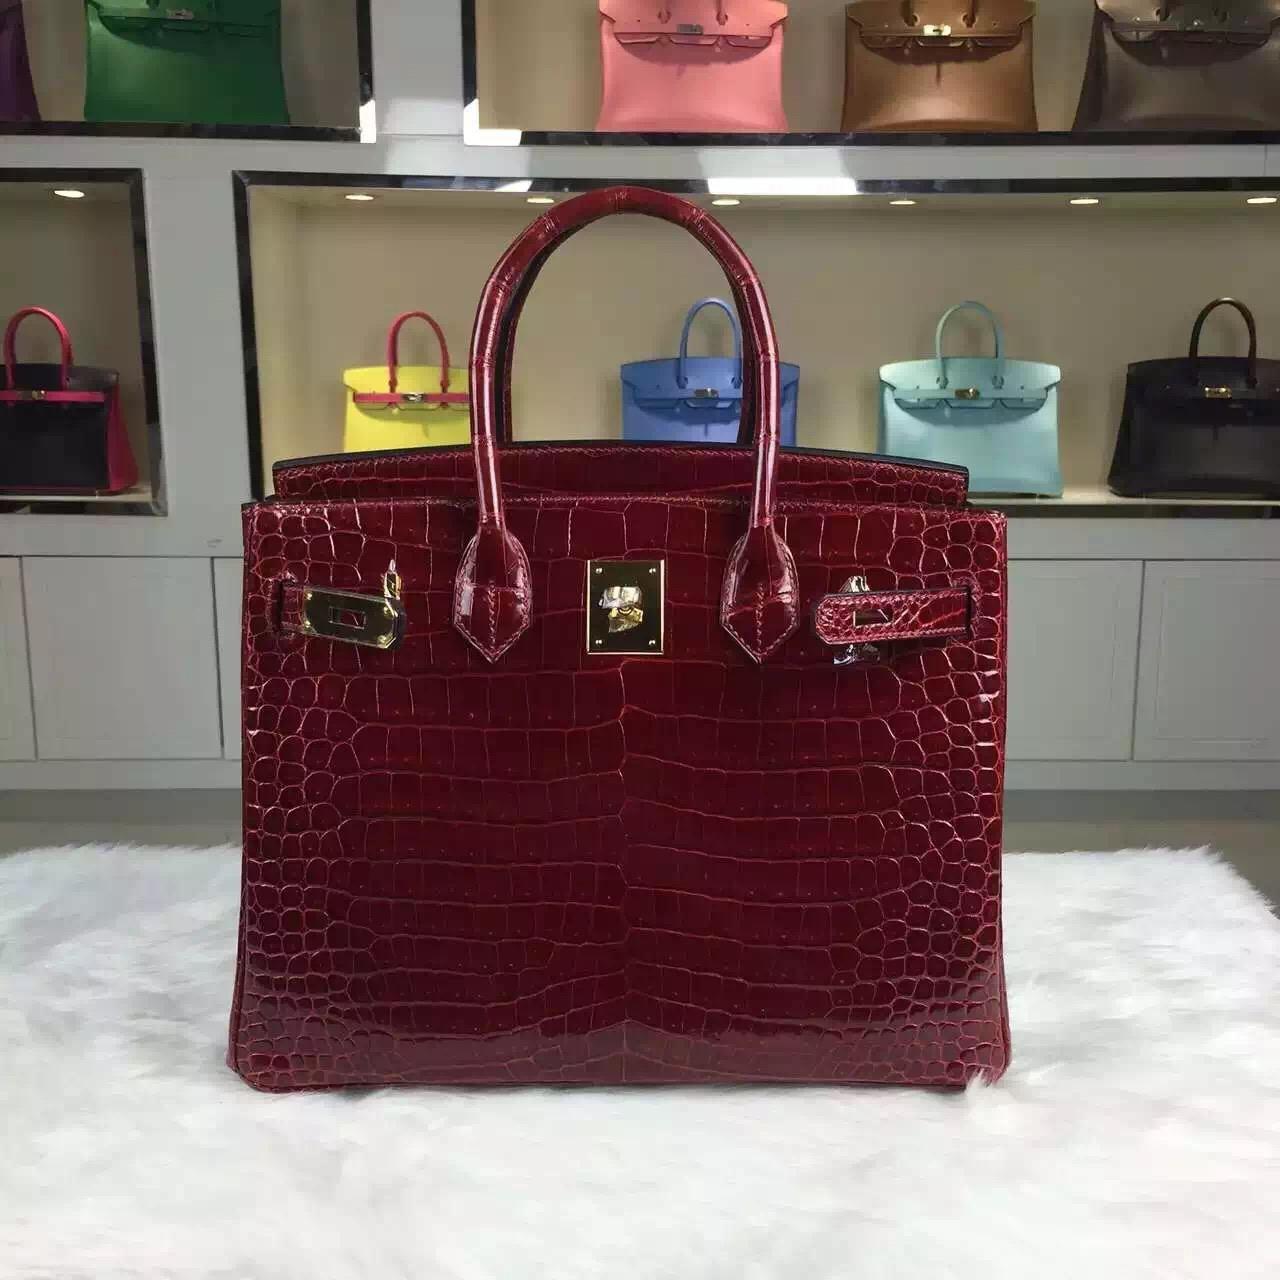 Wholesale Hermes Wine Red Original Crocodile Leather Birkin Bag 30cm Gold Hardware